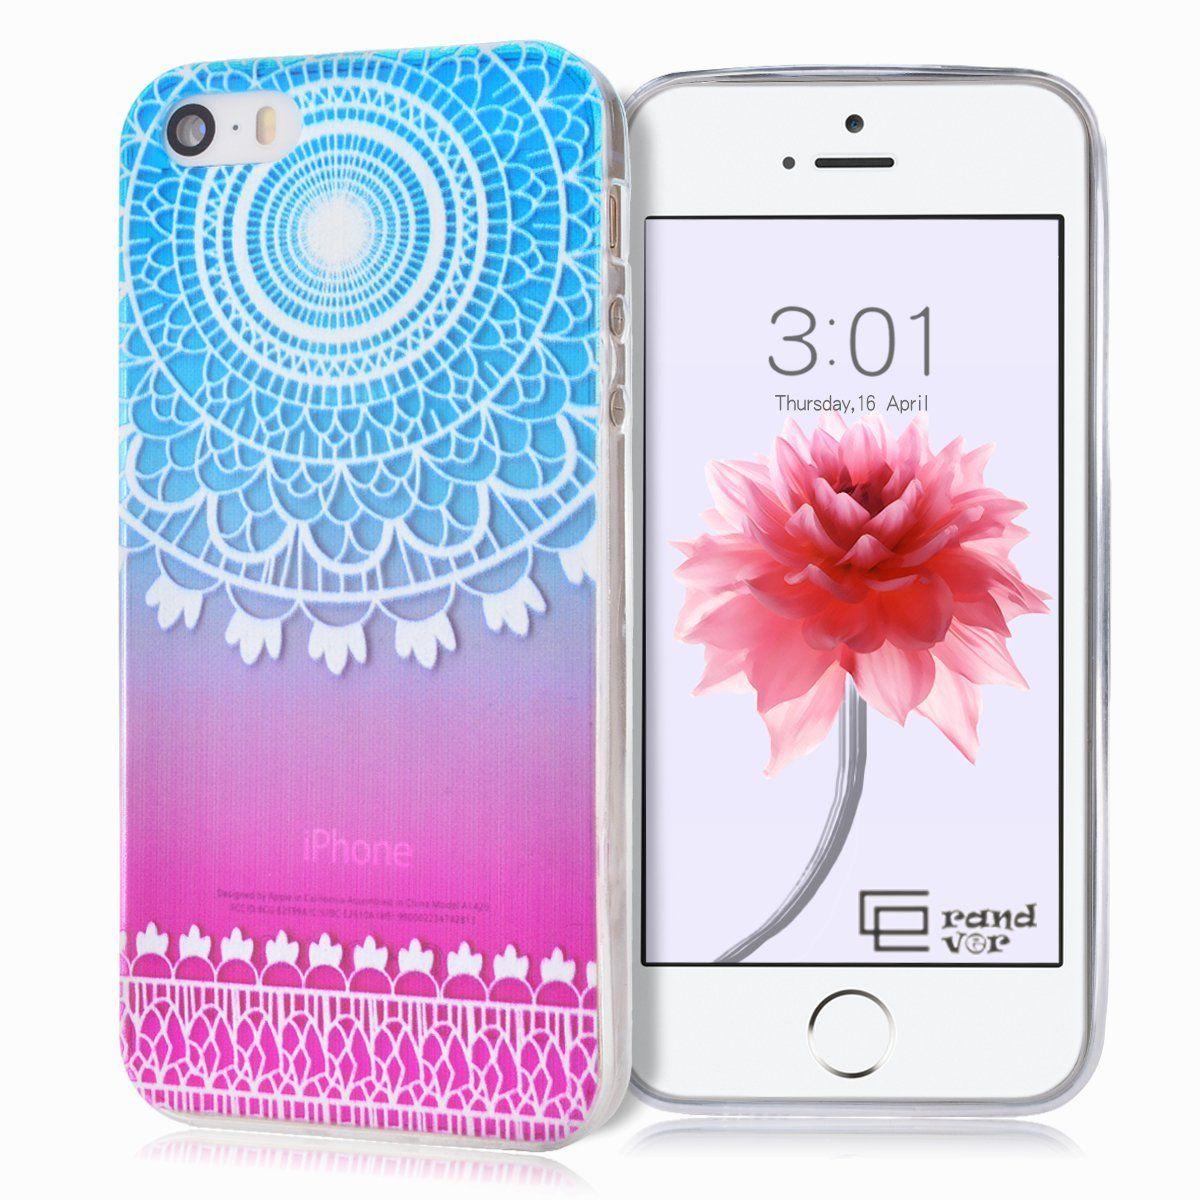 Grandever flexible gel case for iphone 5 iphone 5s tpu